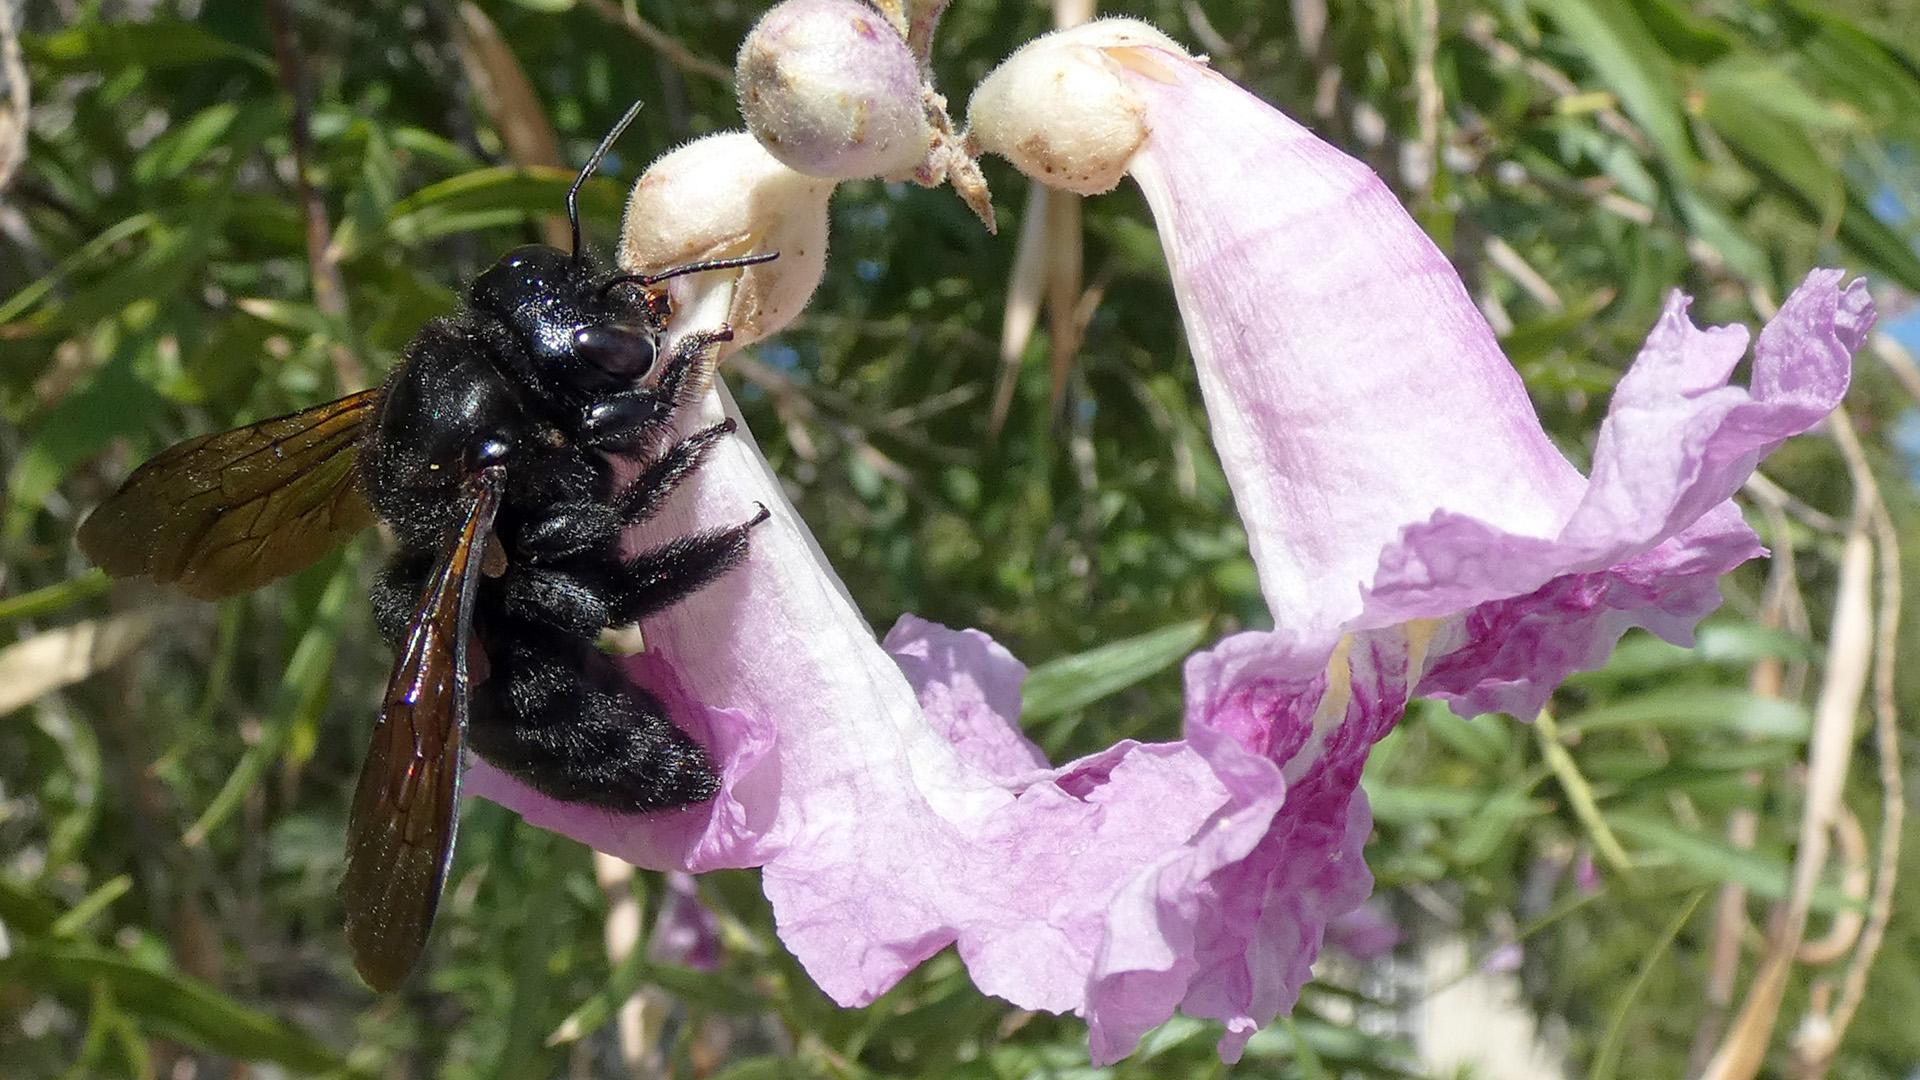 Robbing nectar from desert willow, Albuquerque, September 2020